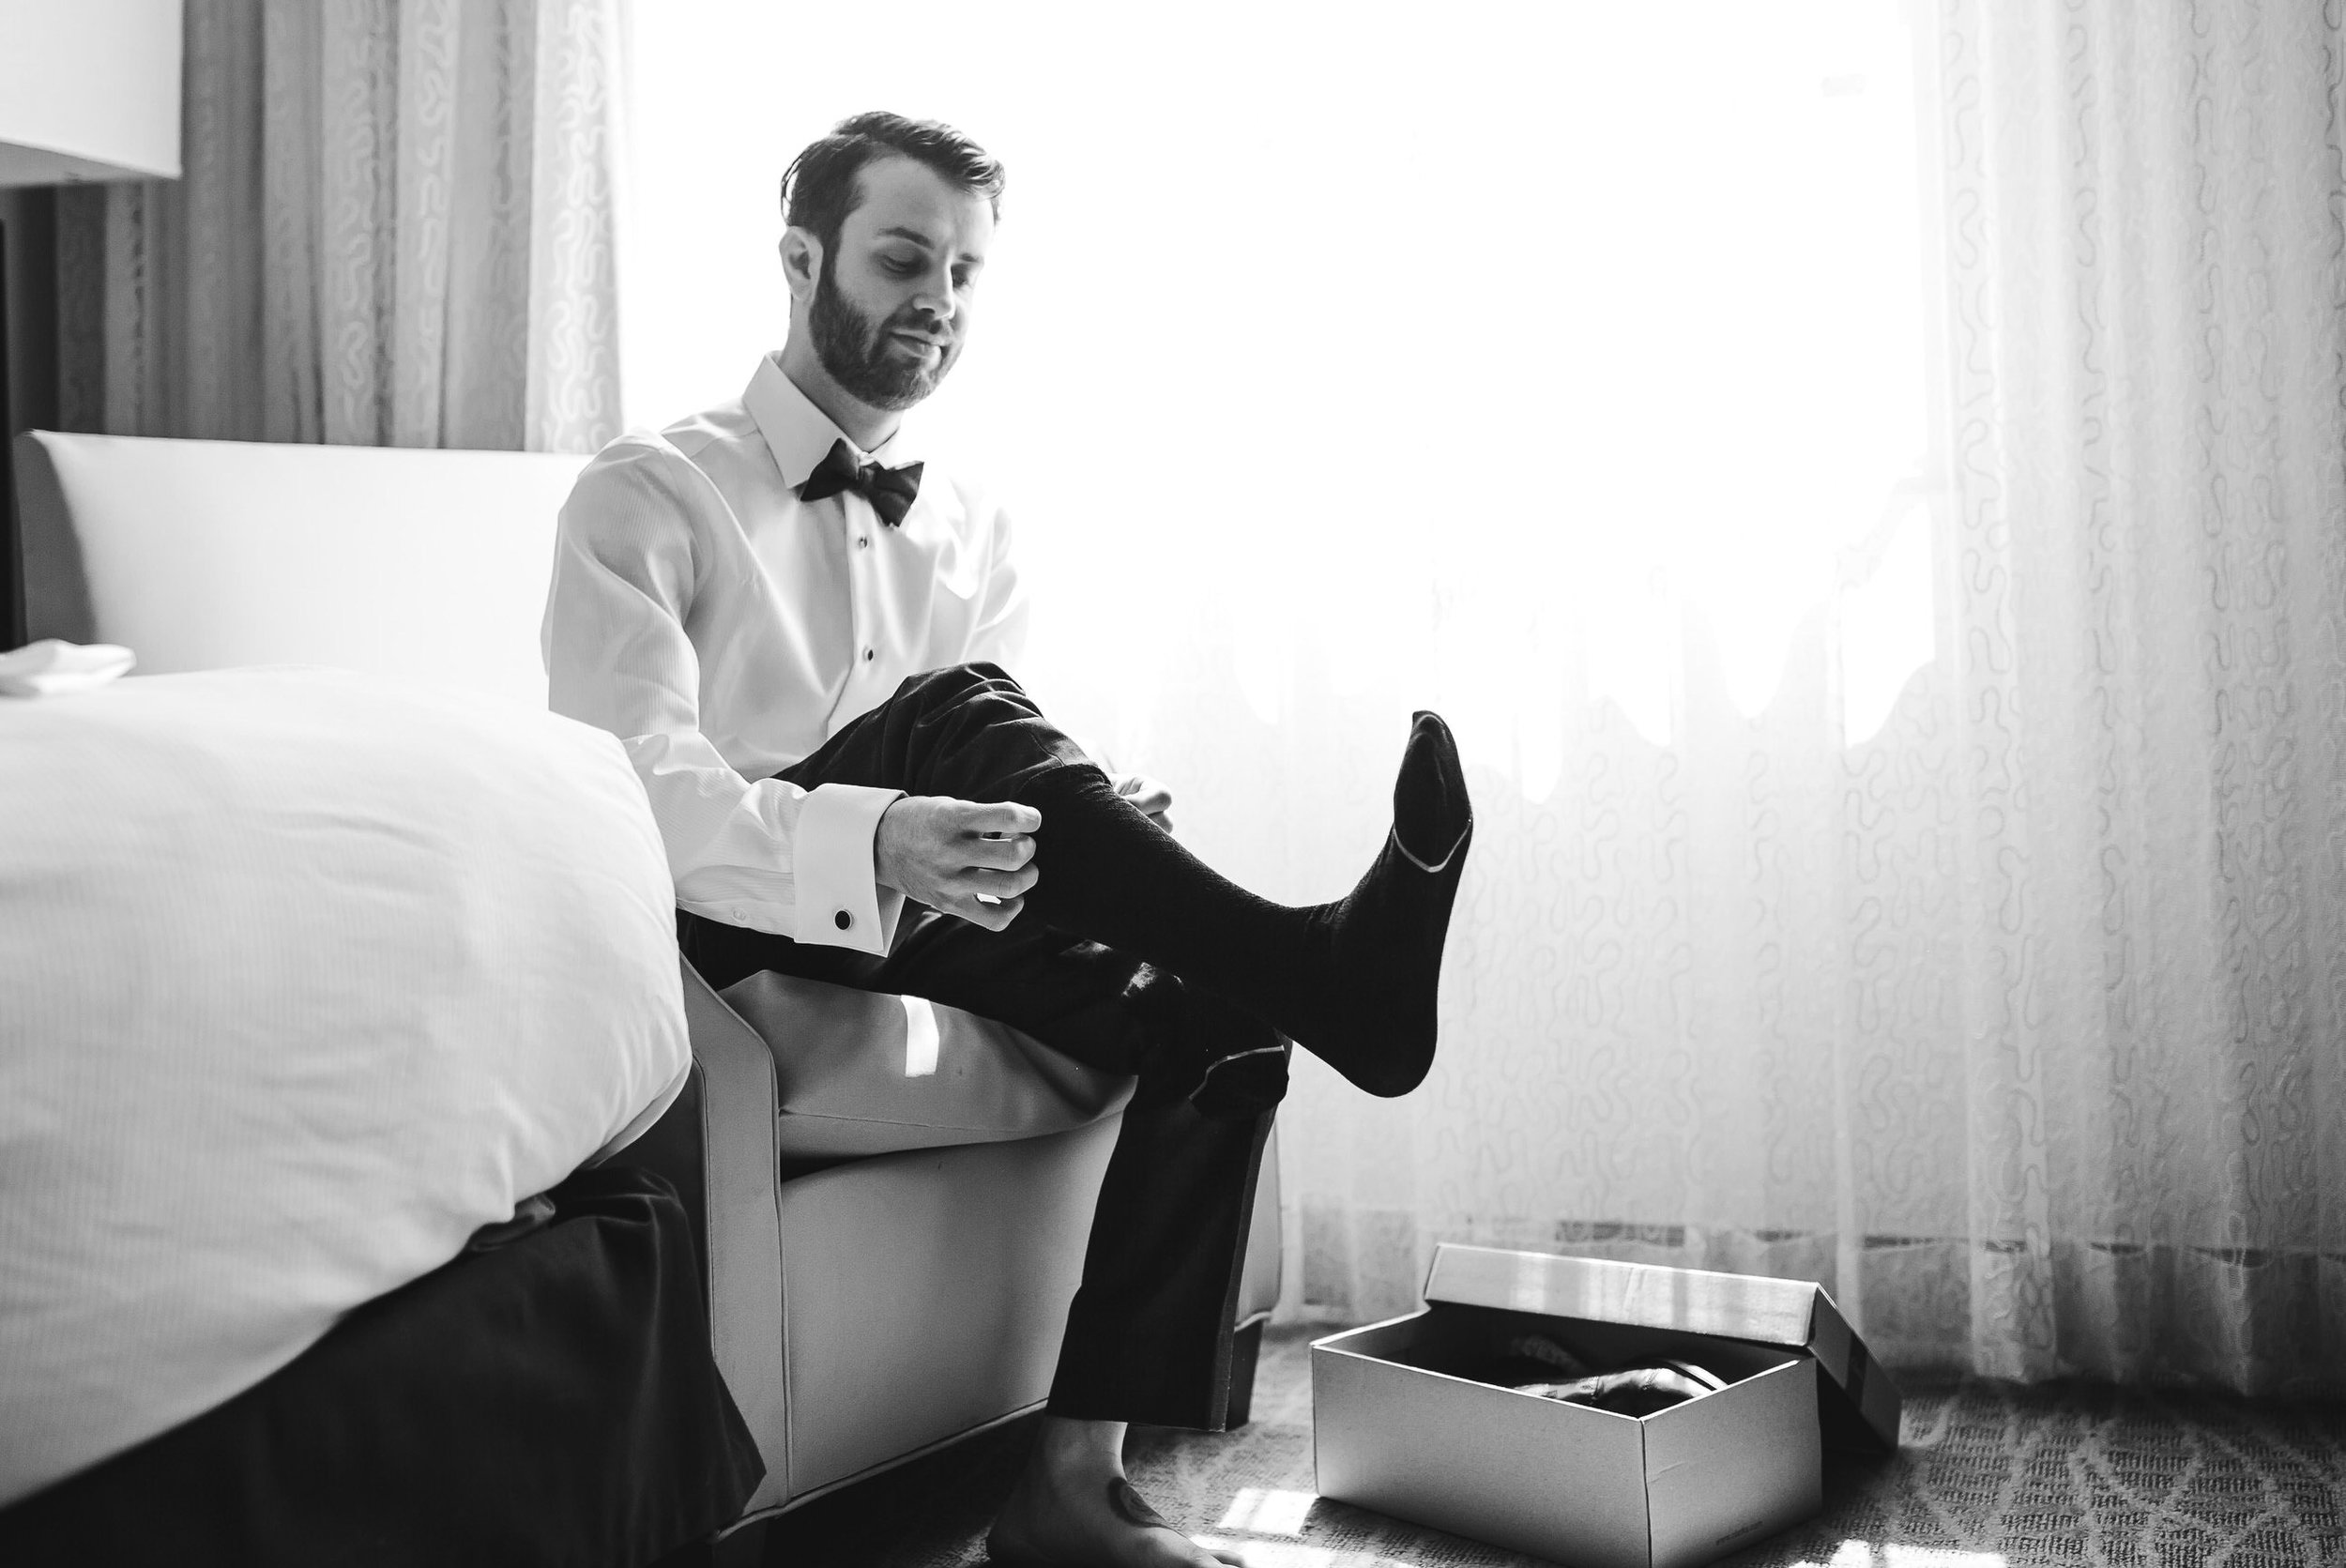 groom-getting-ready-seattle-wedding-photographer-42.jpg